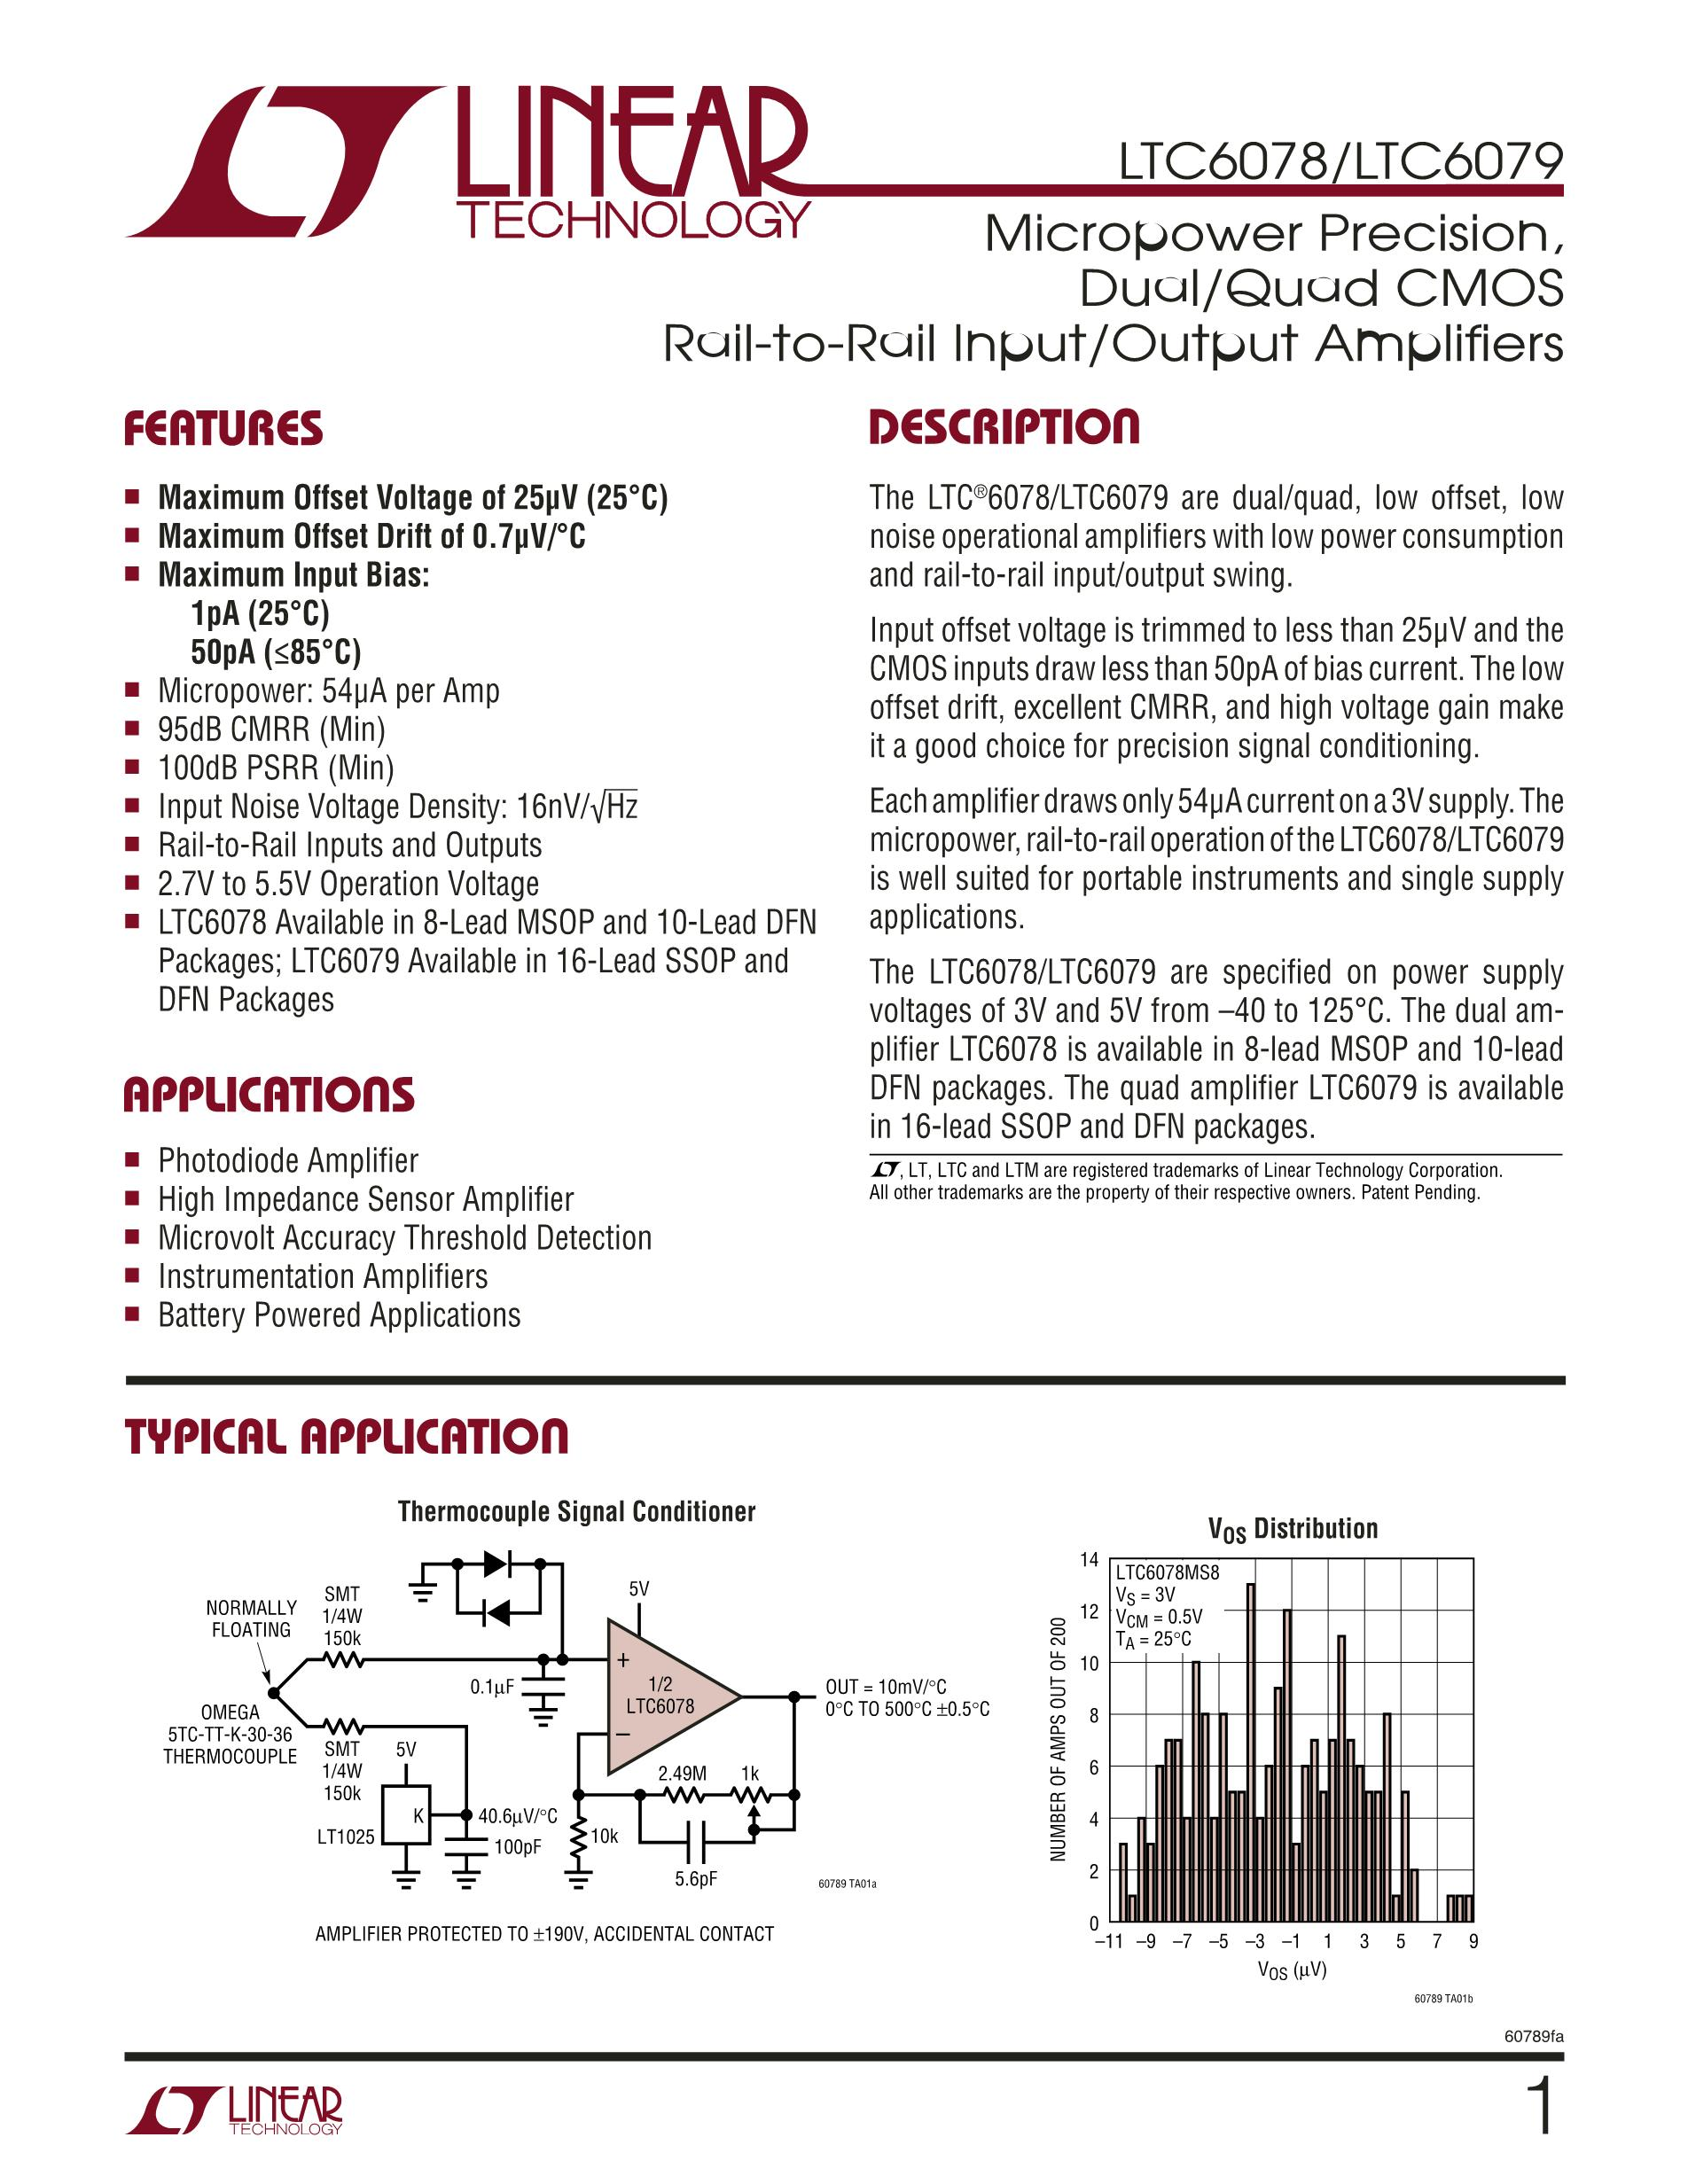 LTC6930CMS8-8.00#TRPBF's pdf picture 1